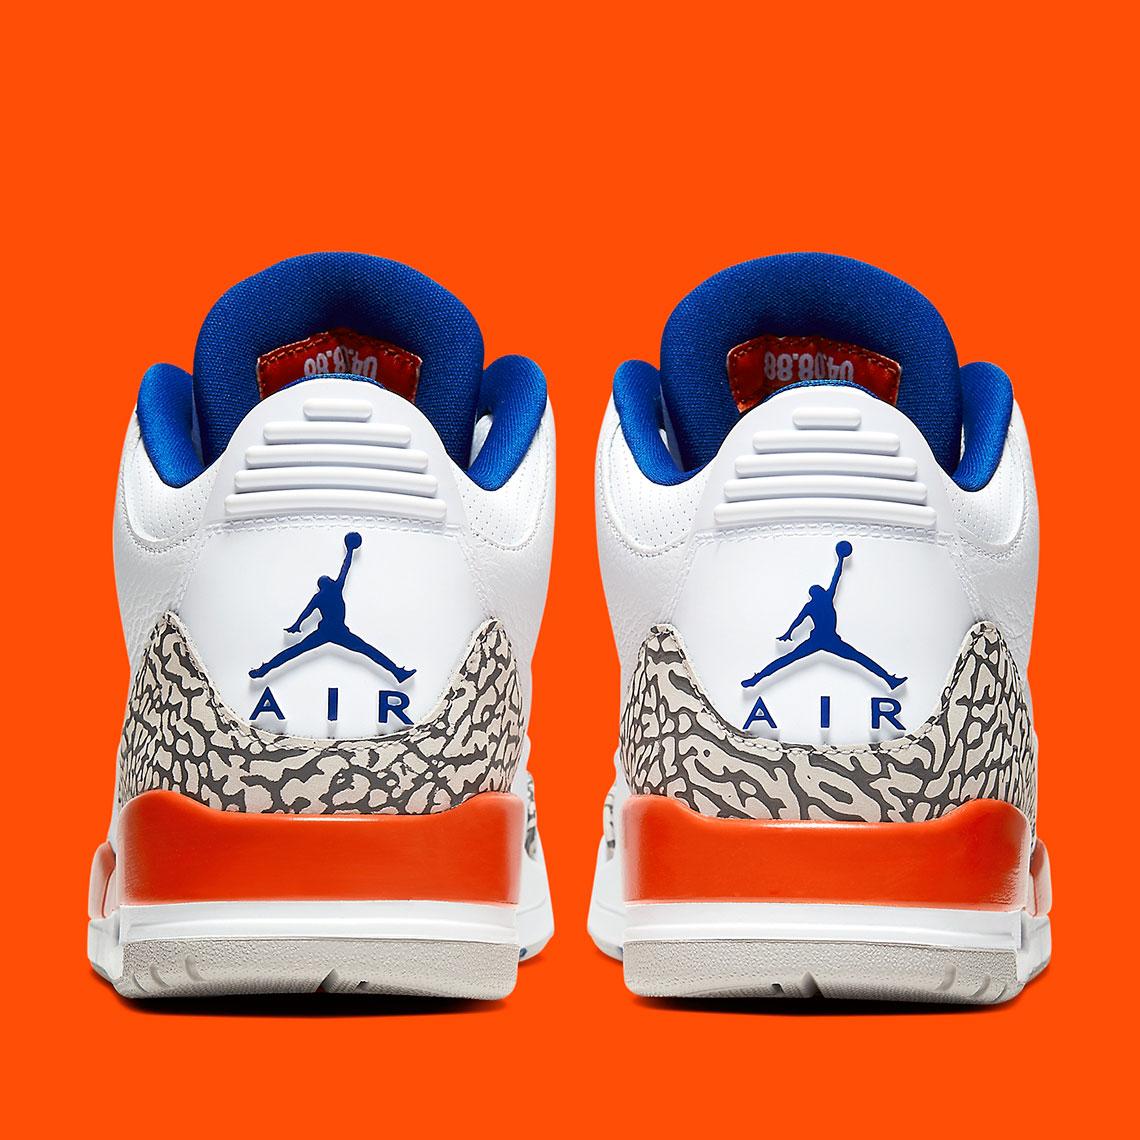 jordan 3 orange and blue